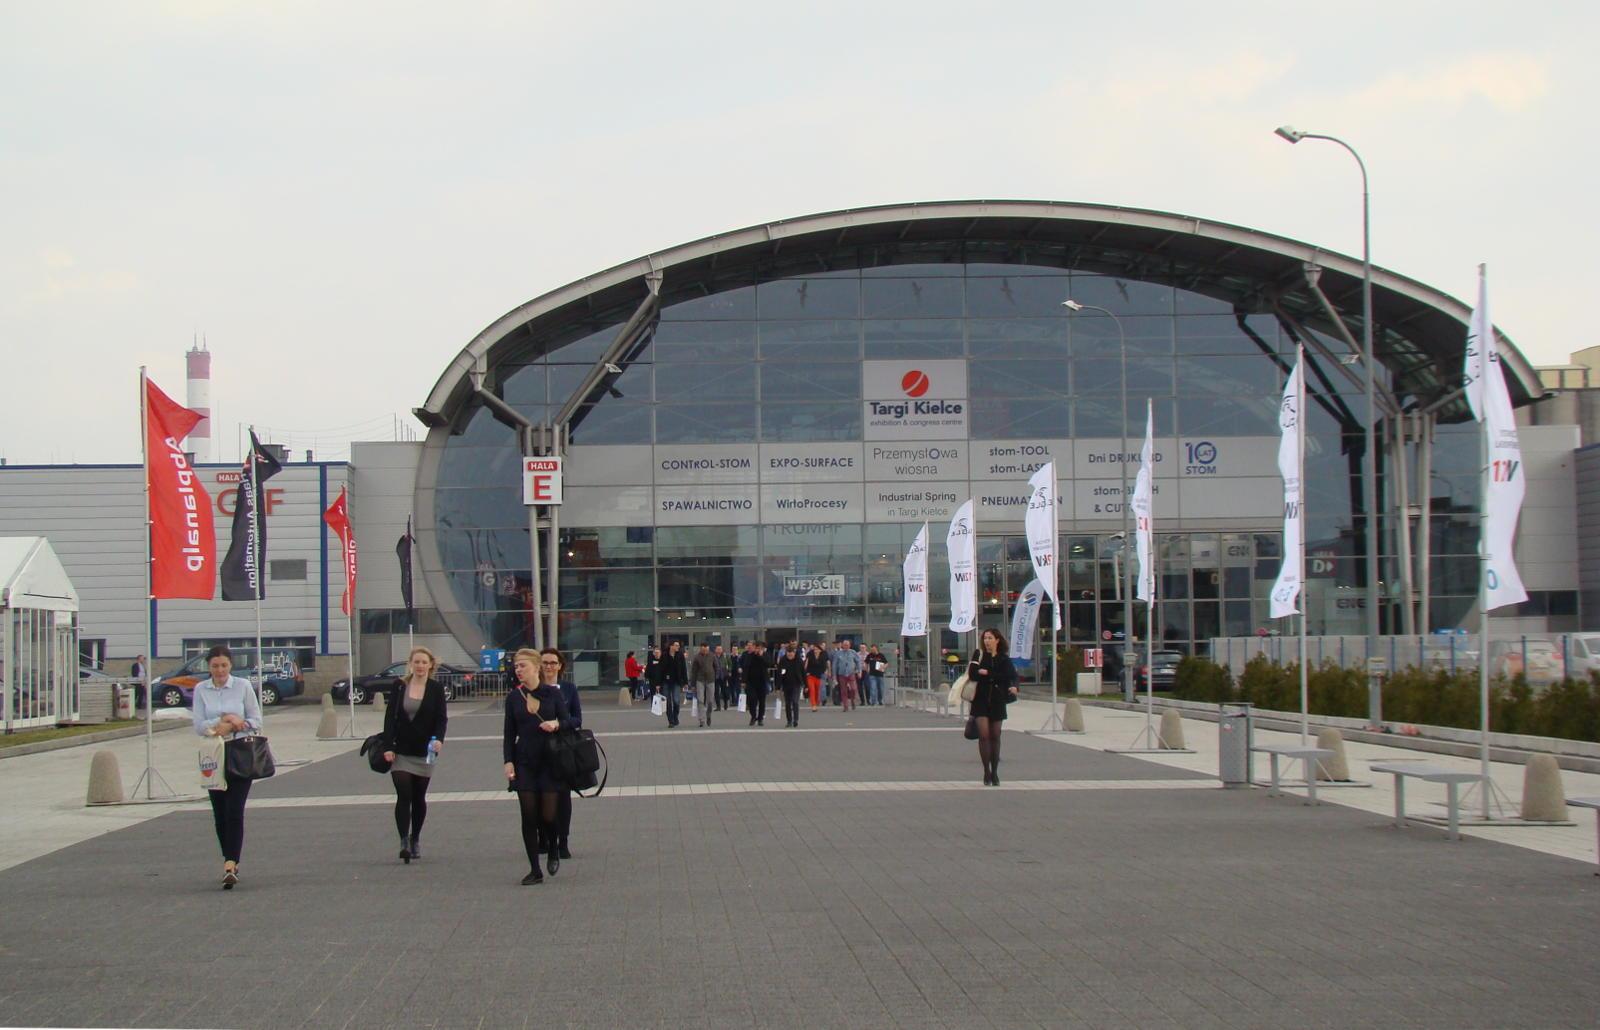 Targi Kielce 2017